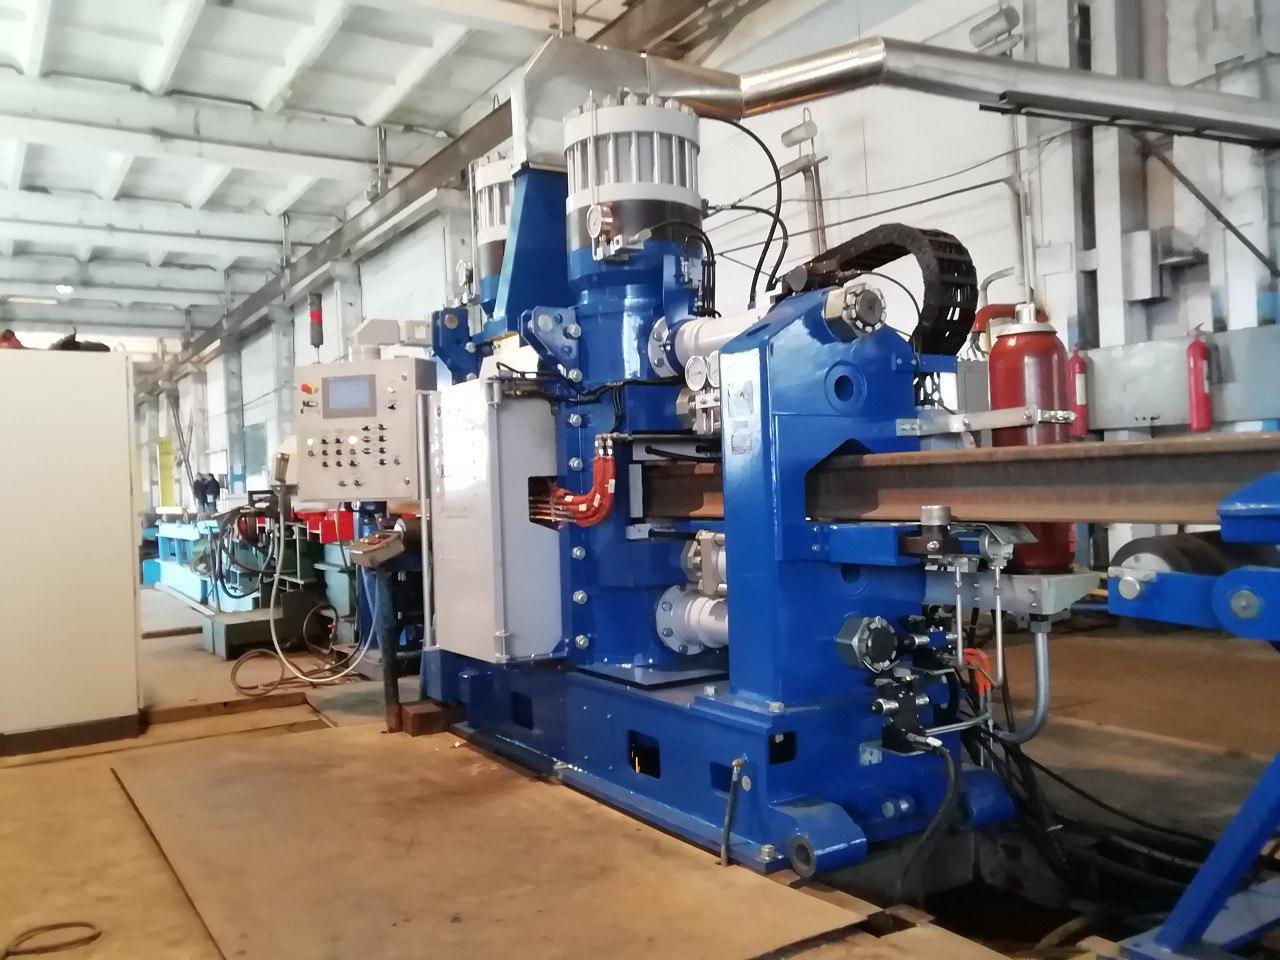 New Rail Welding Machine For Kazakhstan Temir Zholy